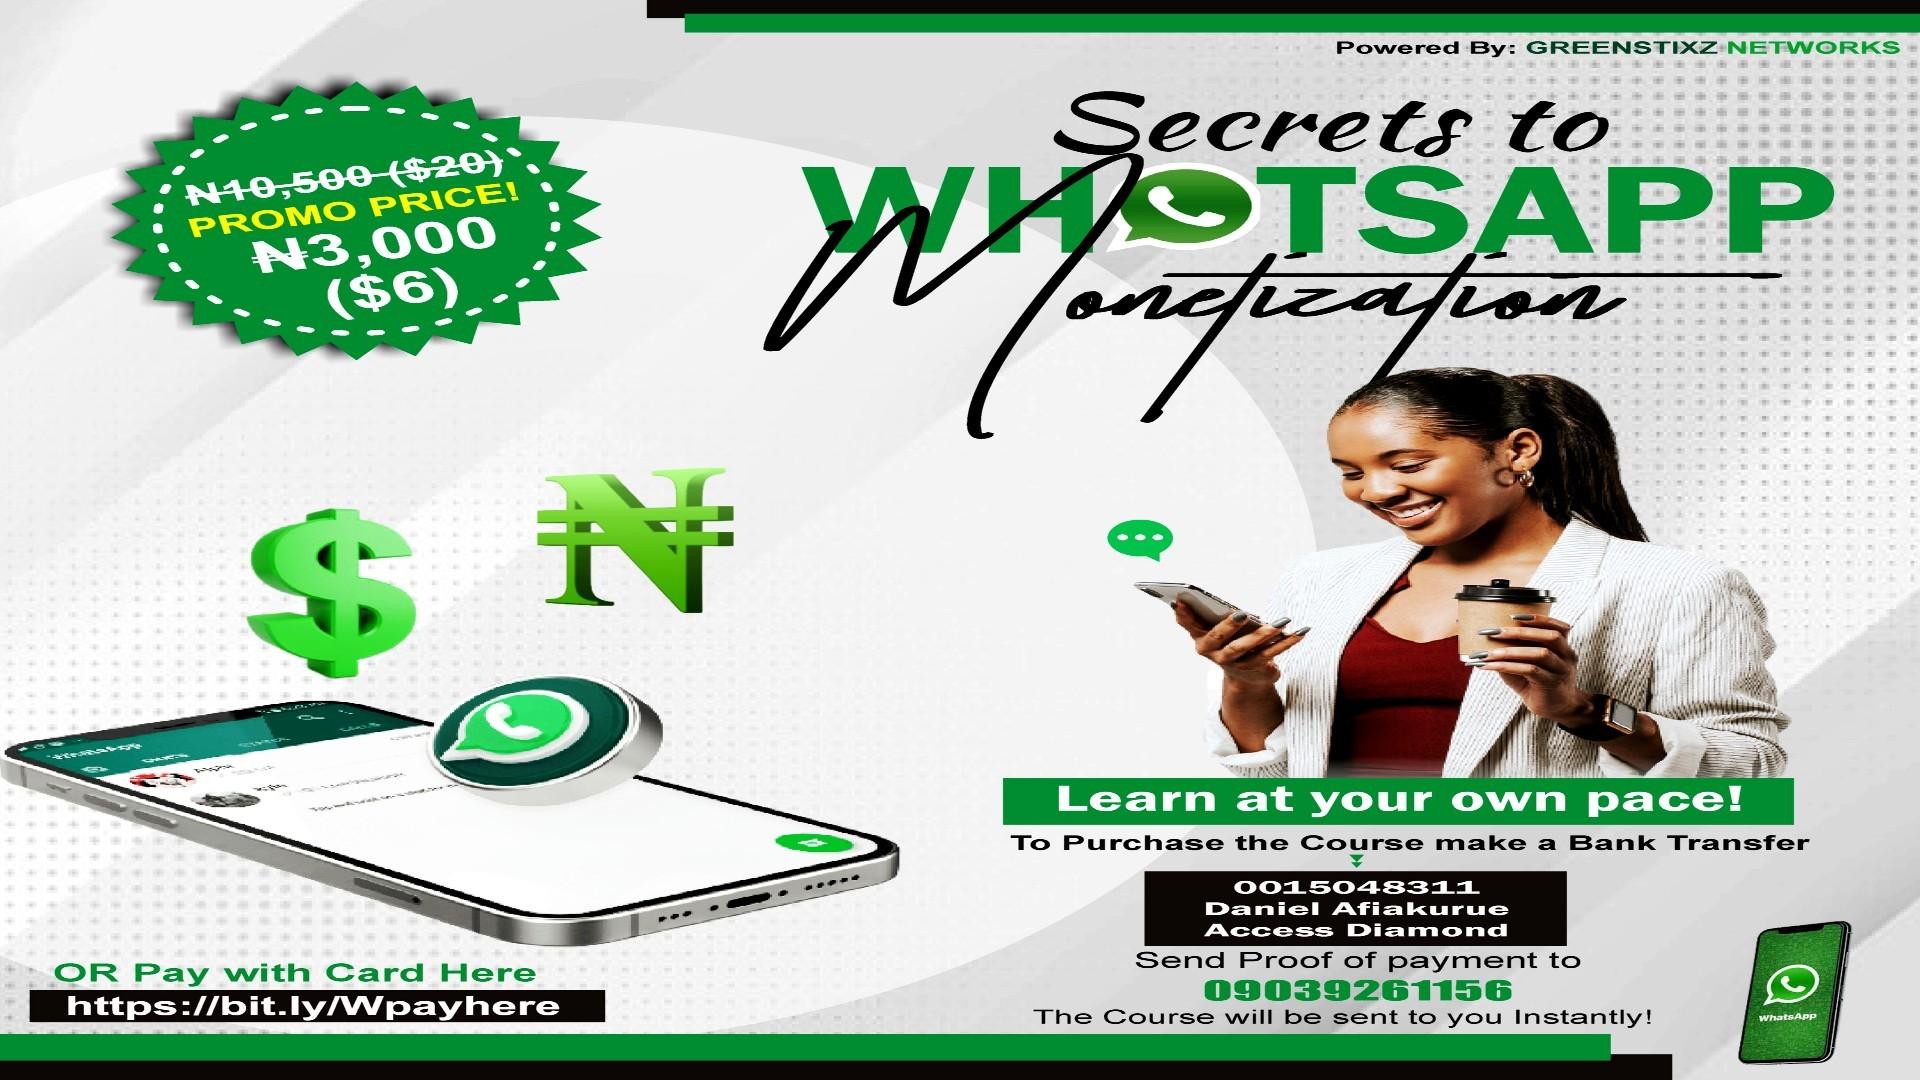 AppSumo Deal for WhatsApp Business School